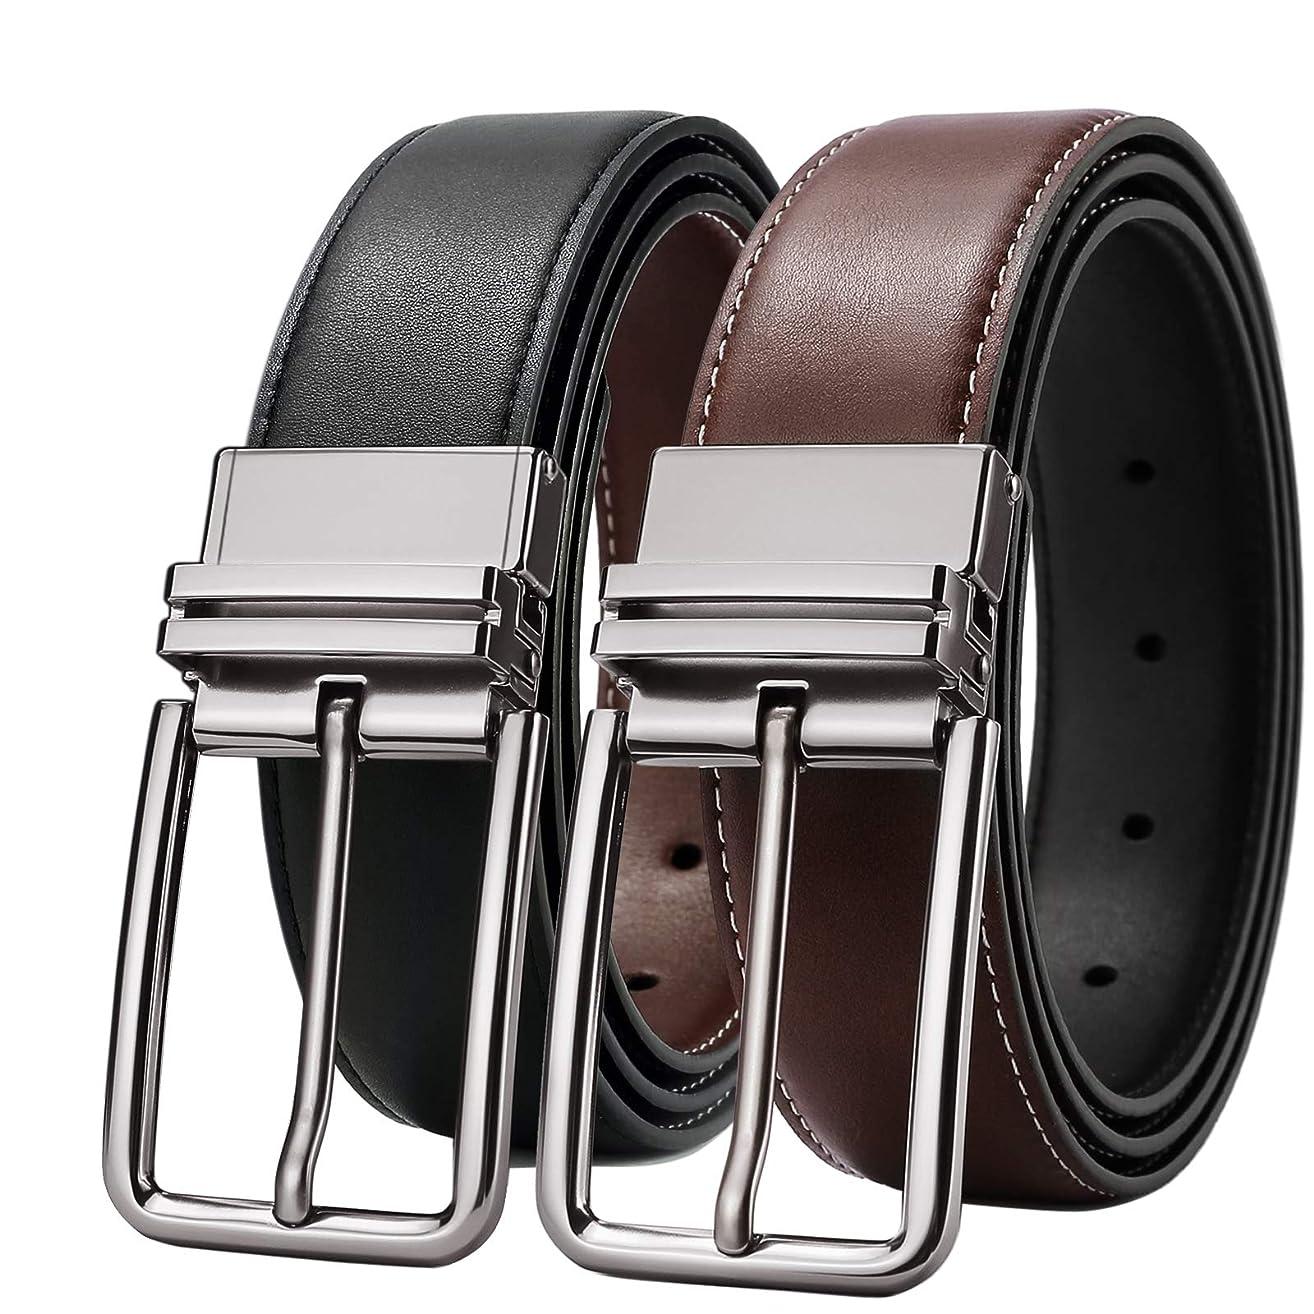 SOPONDER Belts for Men Black and Brown Leather Belts Big and Tall Black and Silver Silver Buckles Dress Belts All Sizes